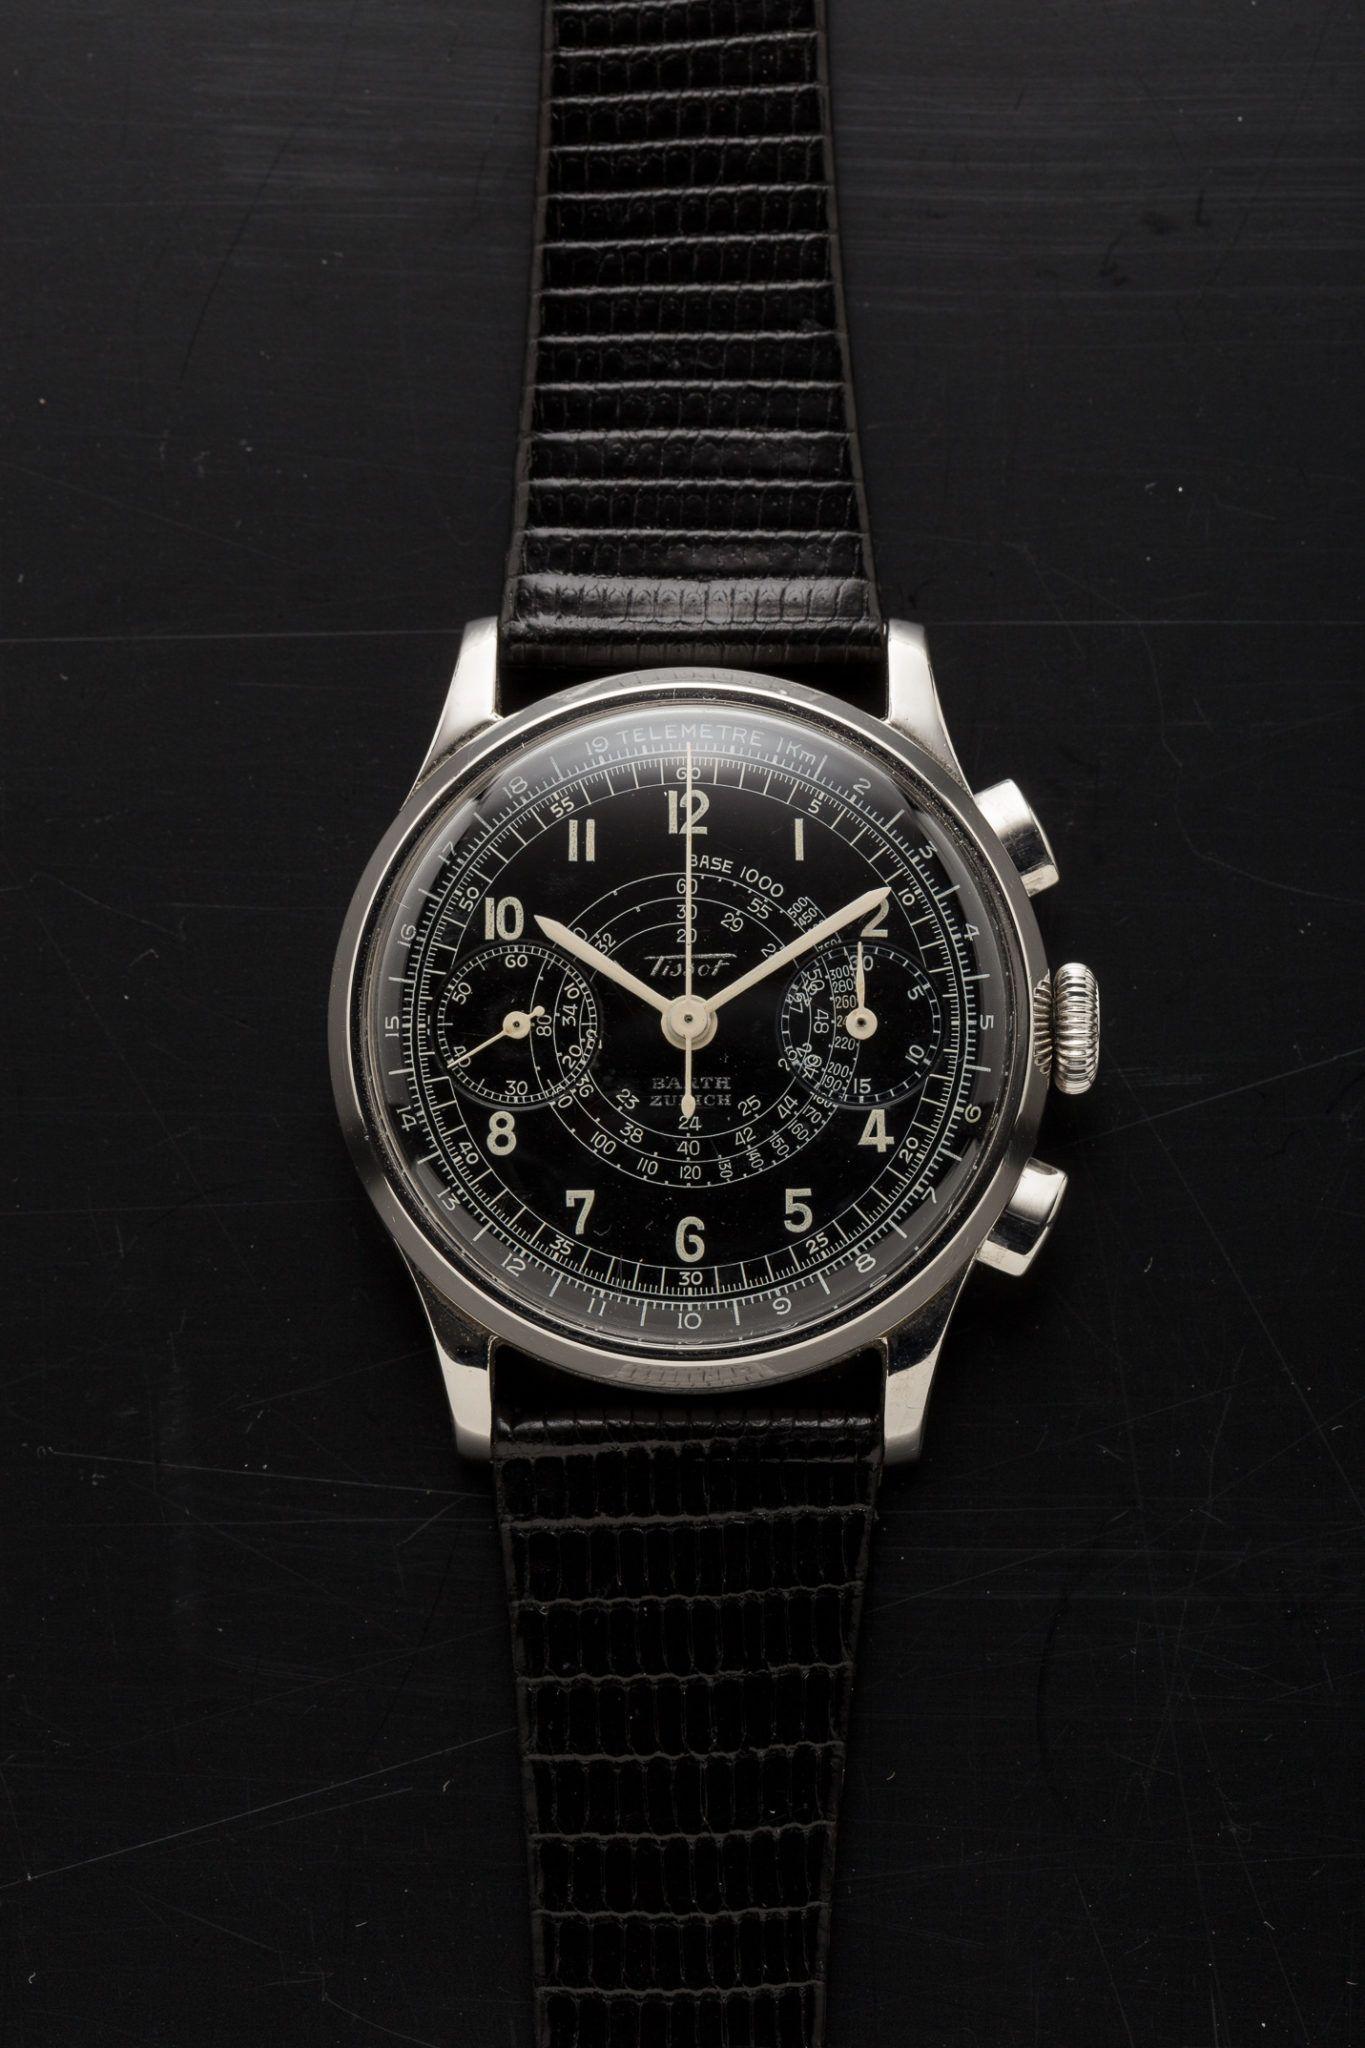 1b9d0ee4212 TISSOT VINTAGE CHRONOGRAPH 15TL Relógios Antigos